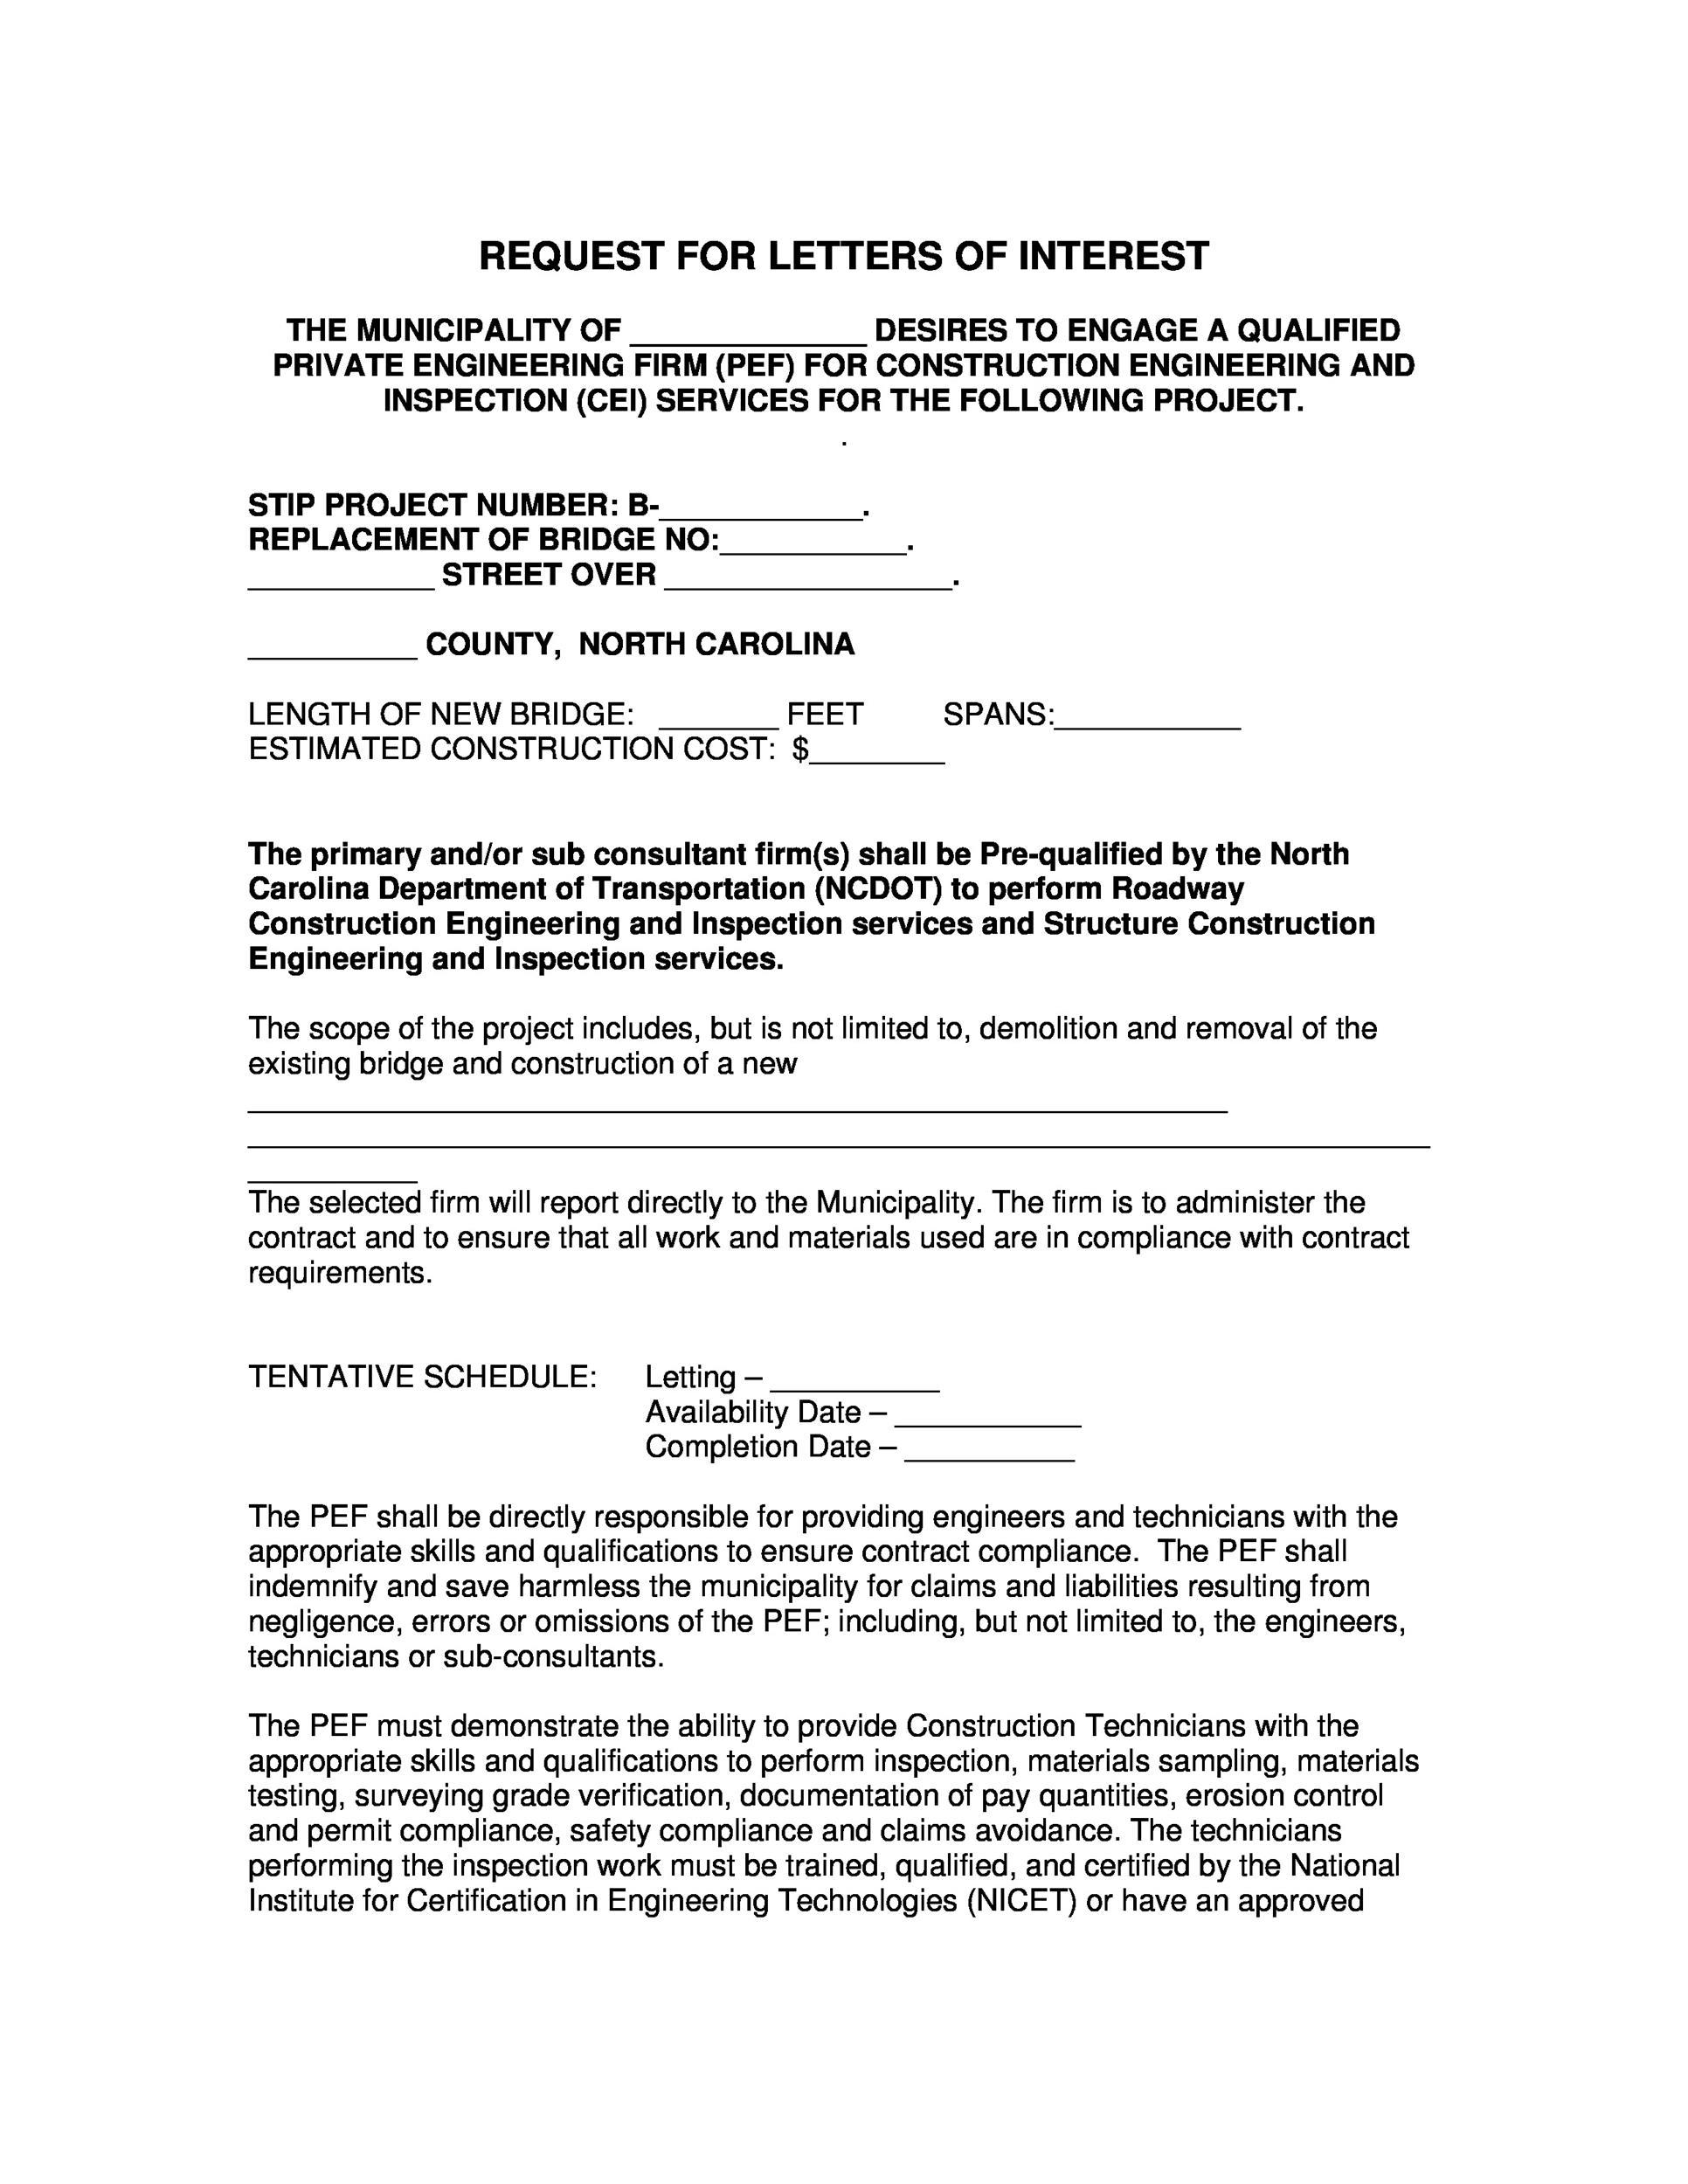 Free letter of interest 29